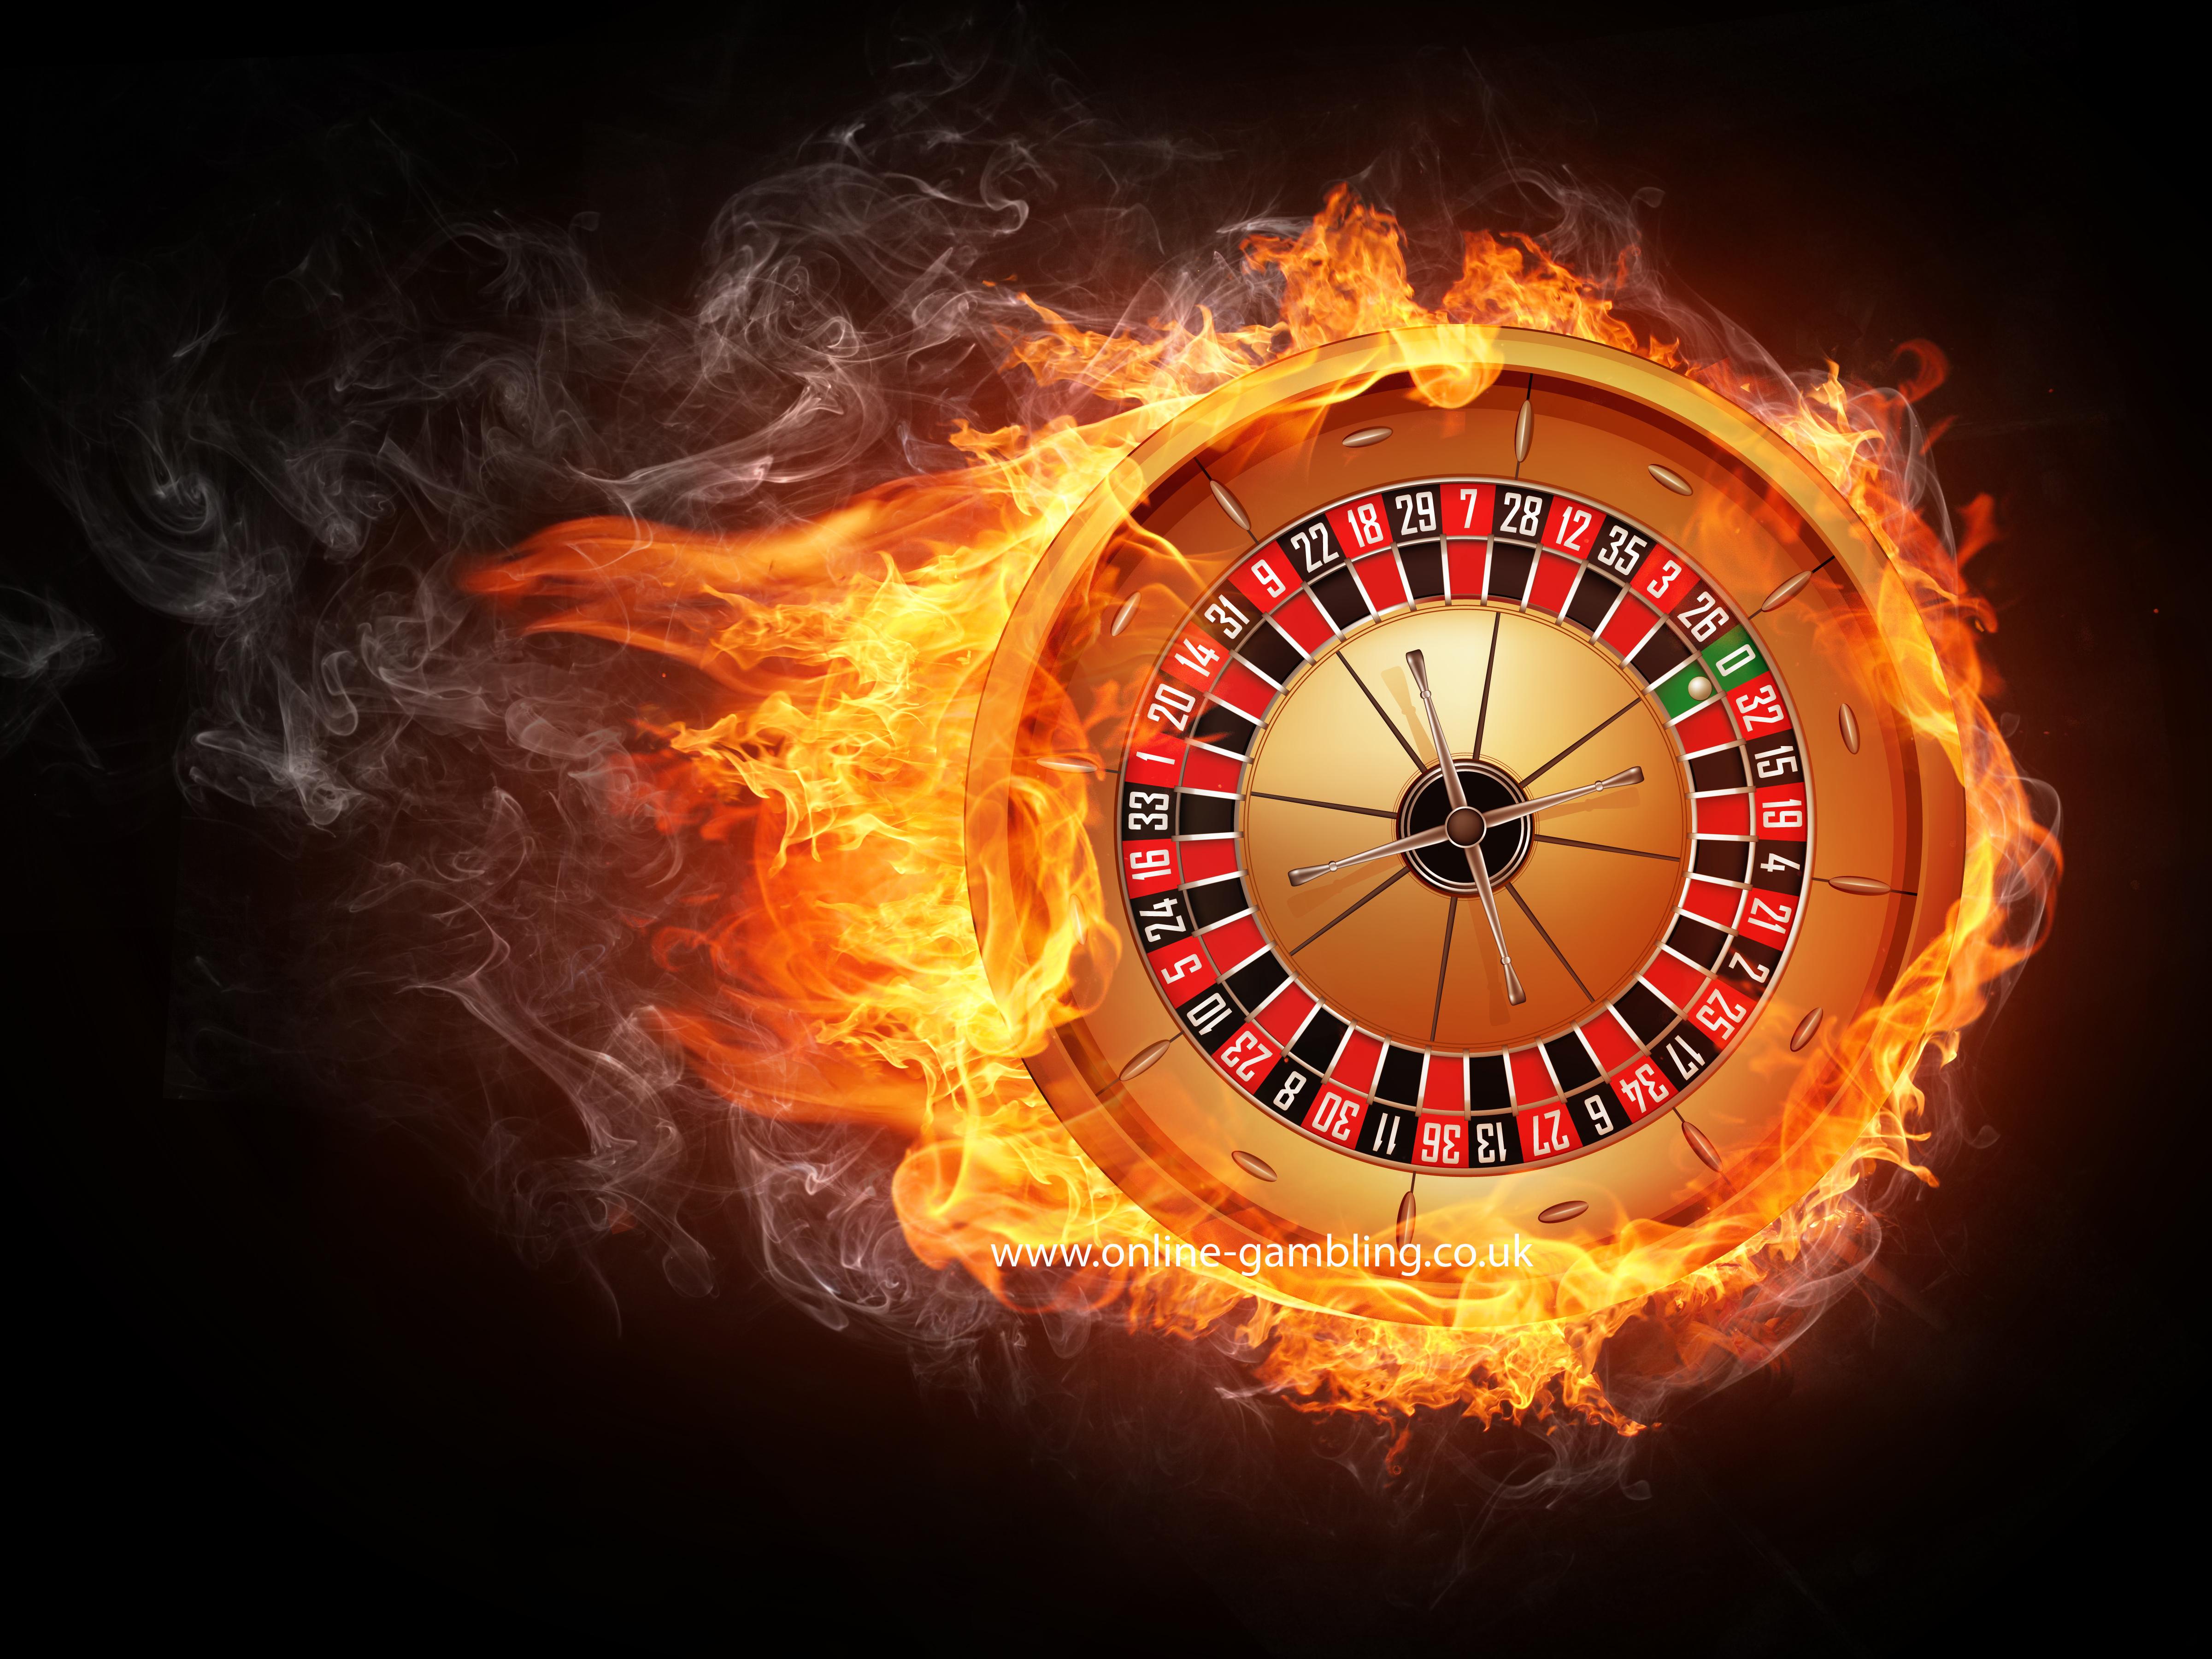 Untitled Document [online gamblingcouk] 4800x3600